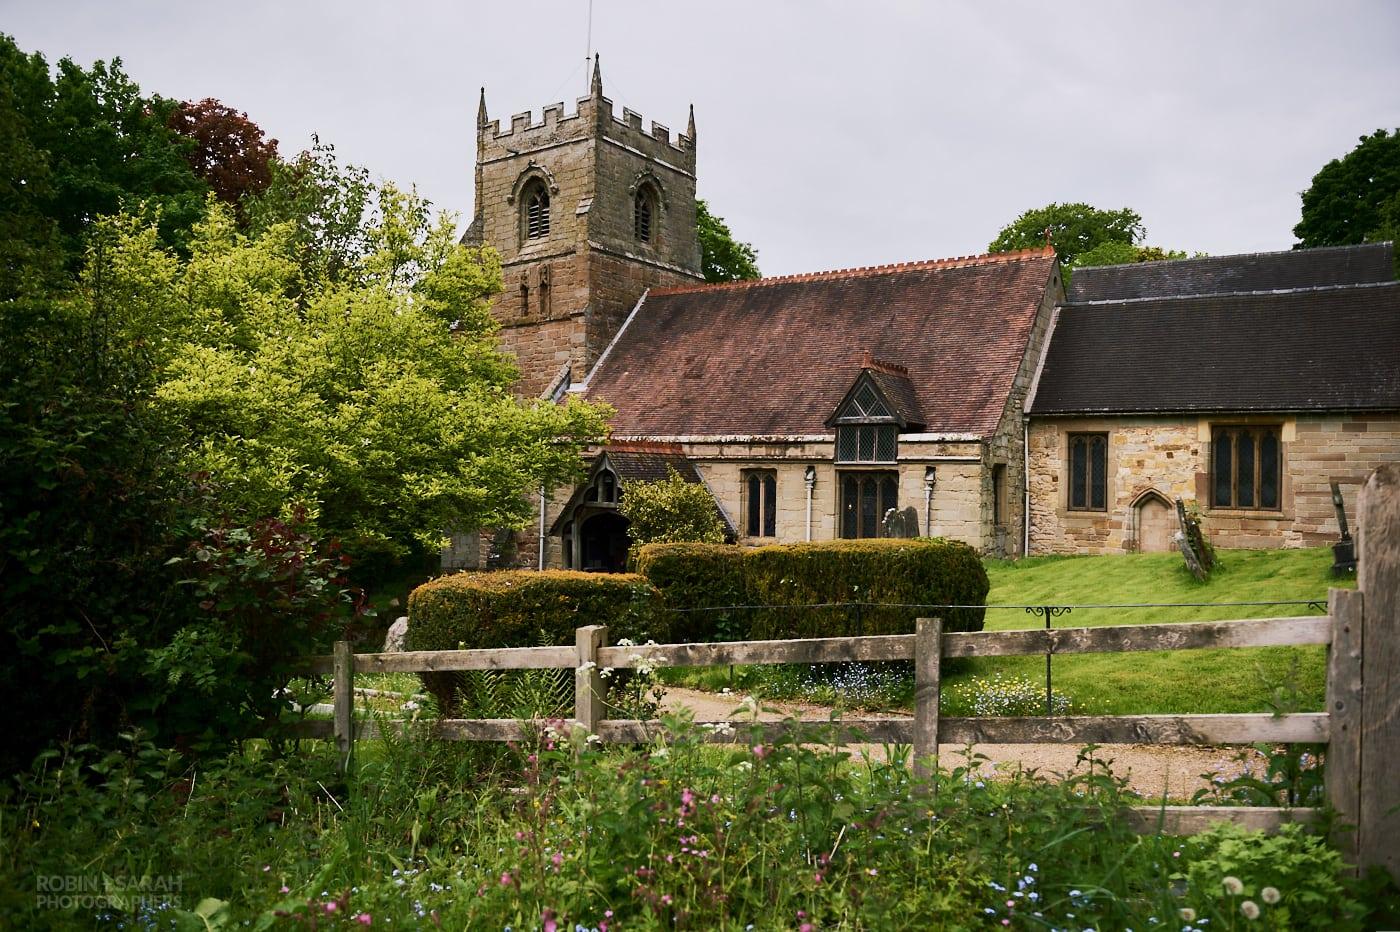 View of St Leonard's church in Beoley near Redditch